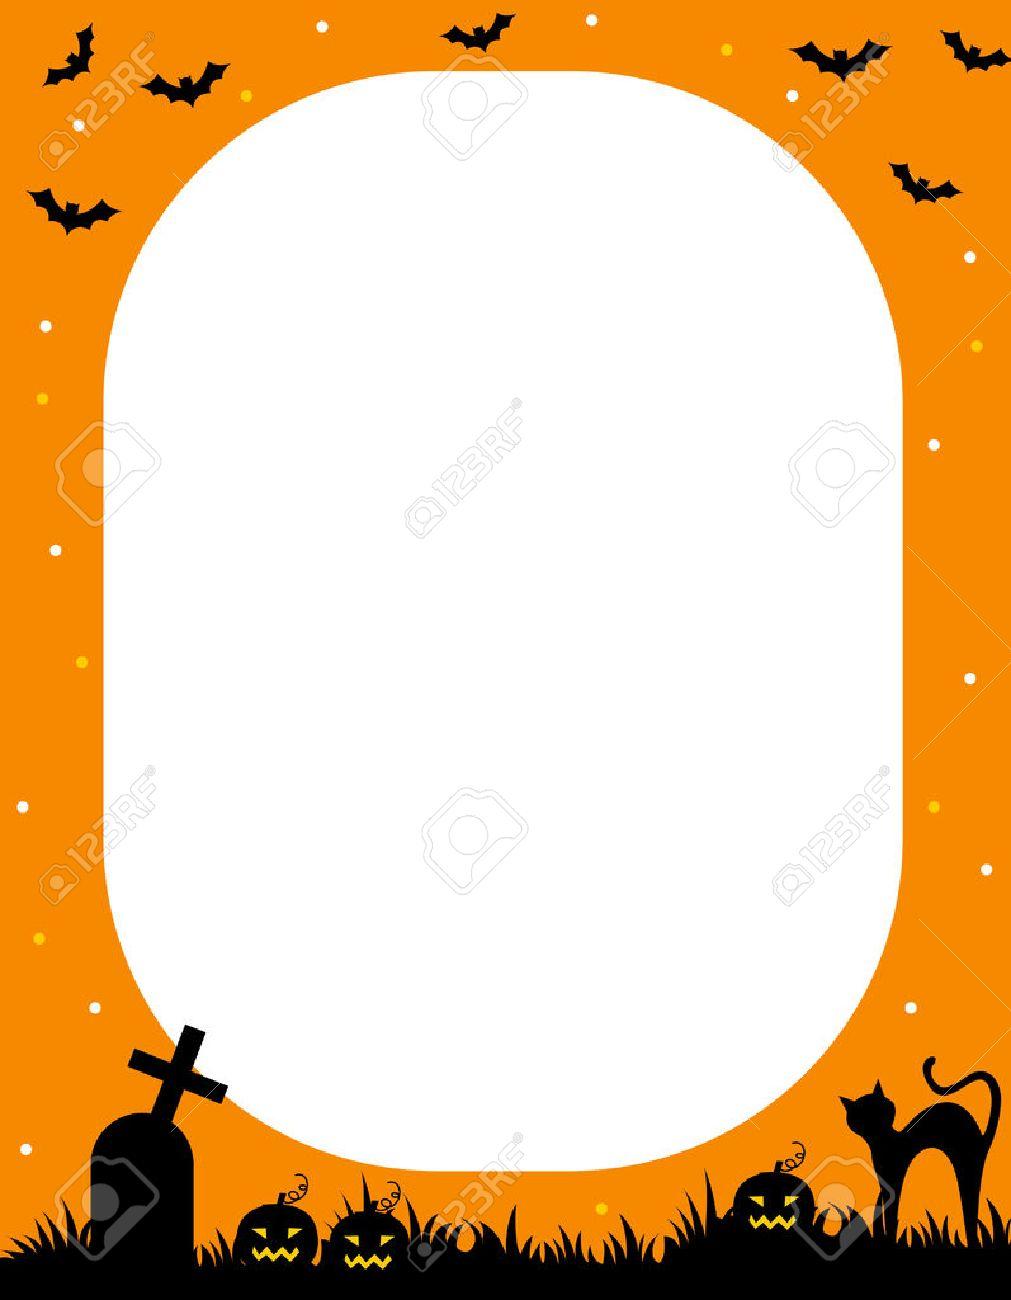 illustration of orange and black halloween frame / border royalty